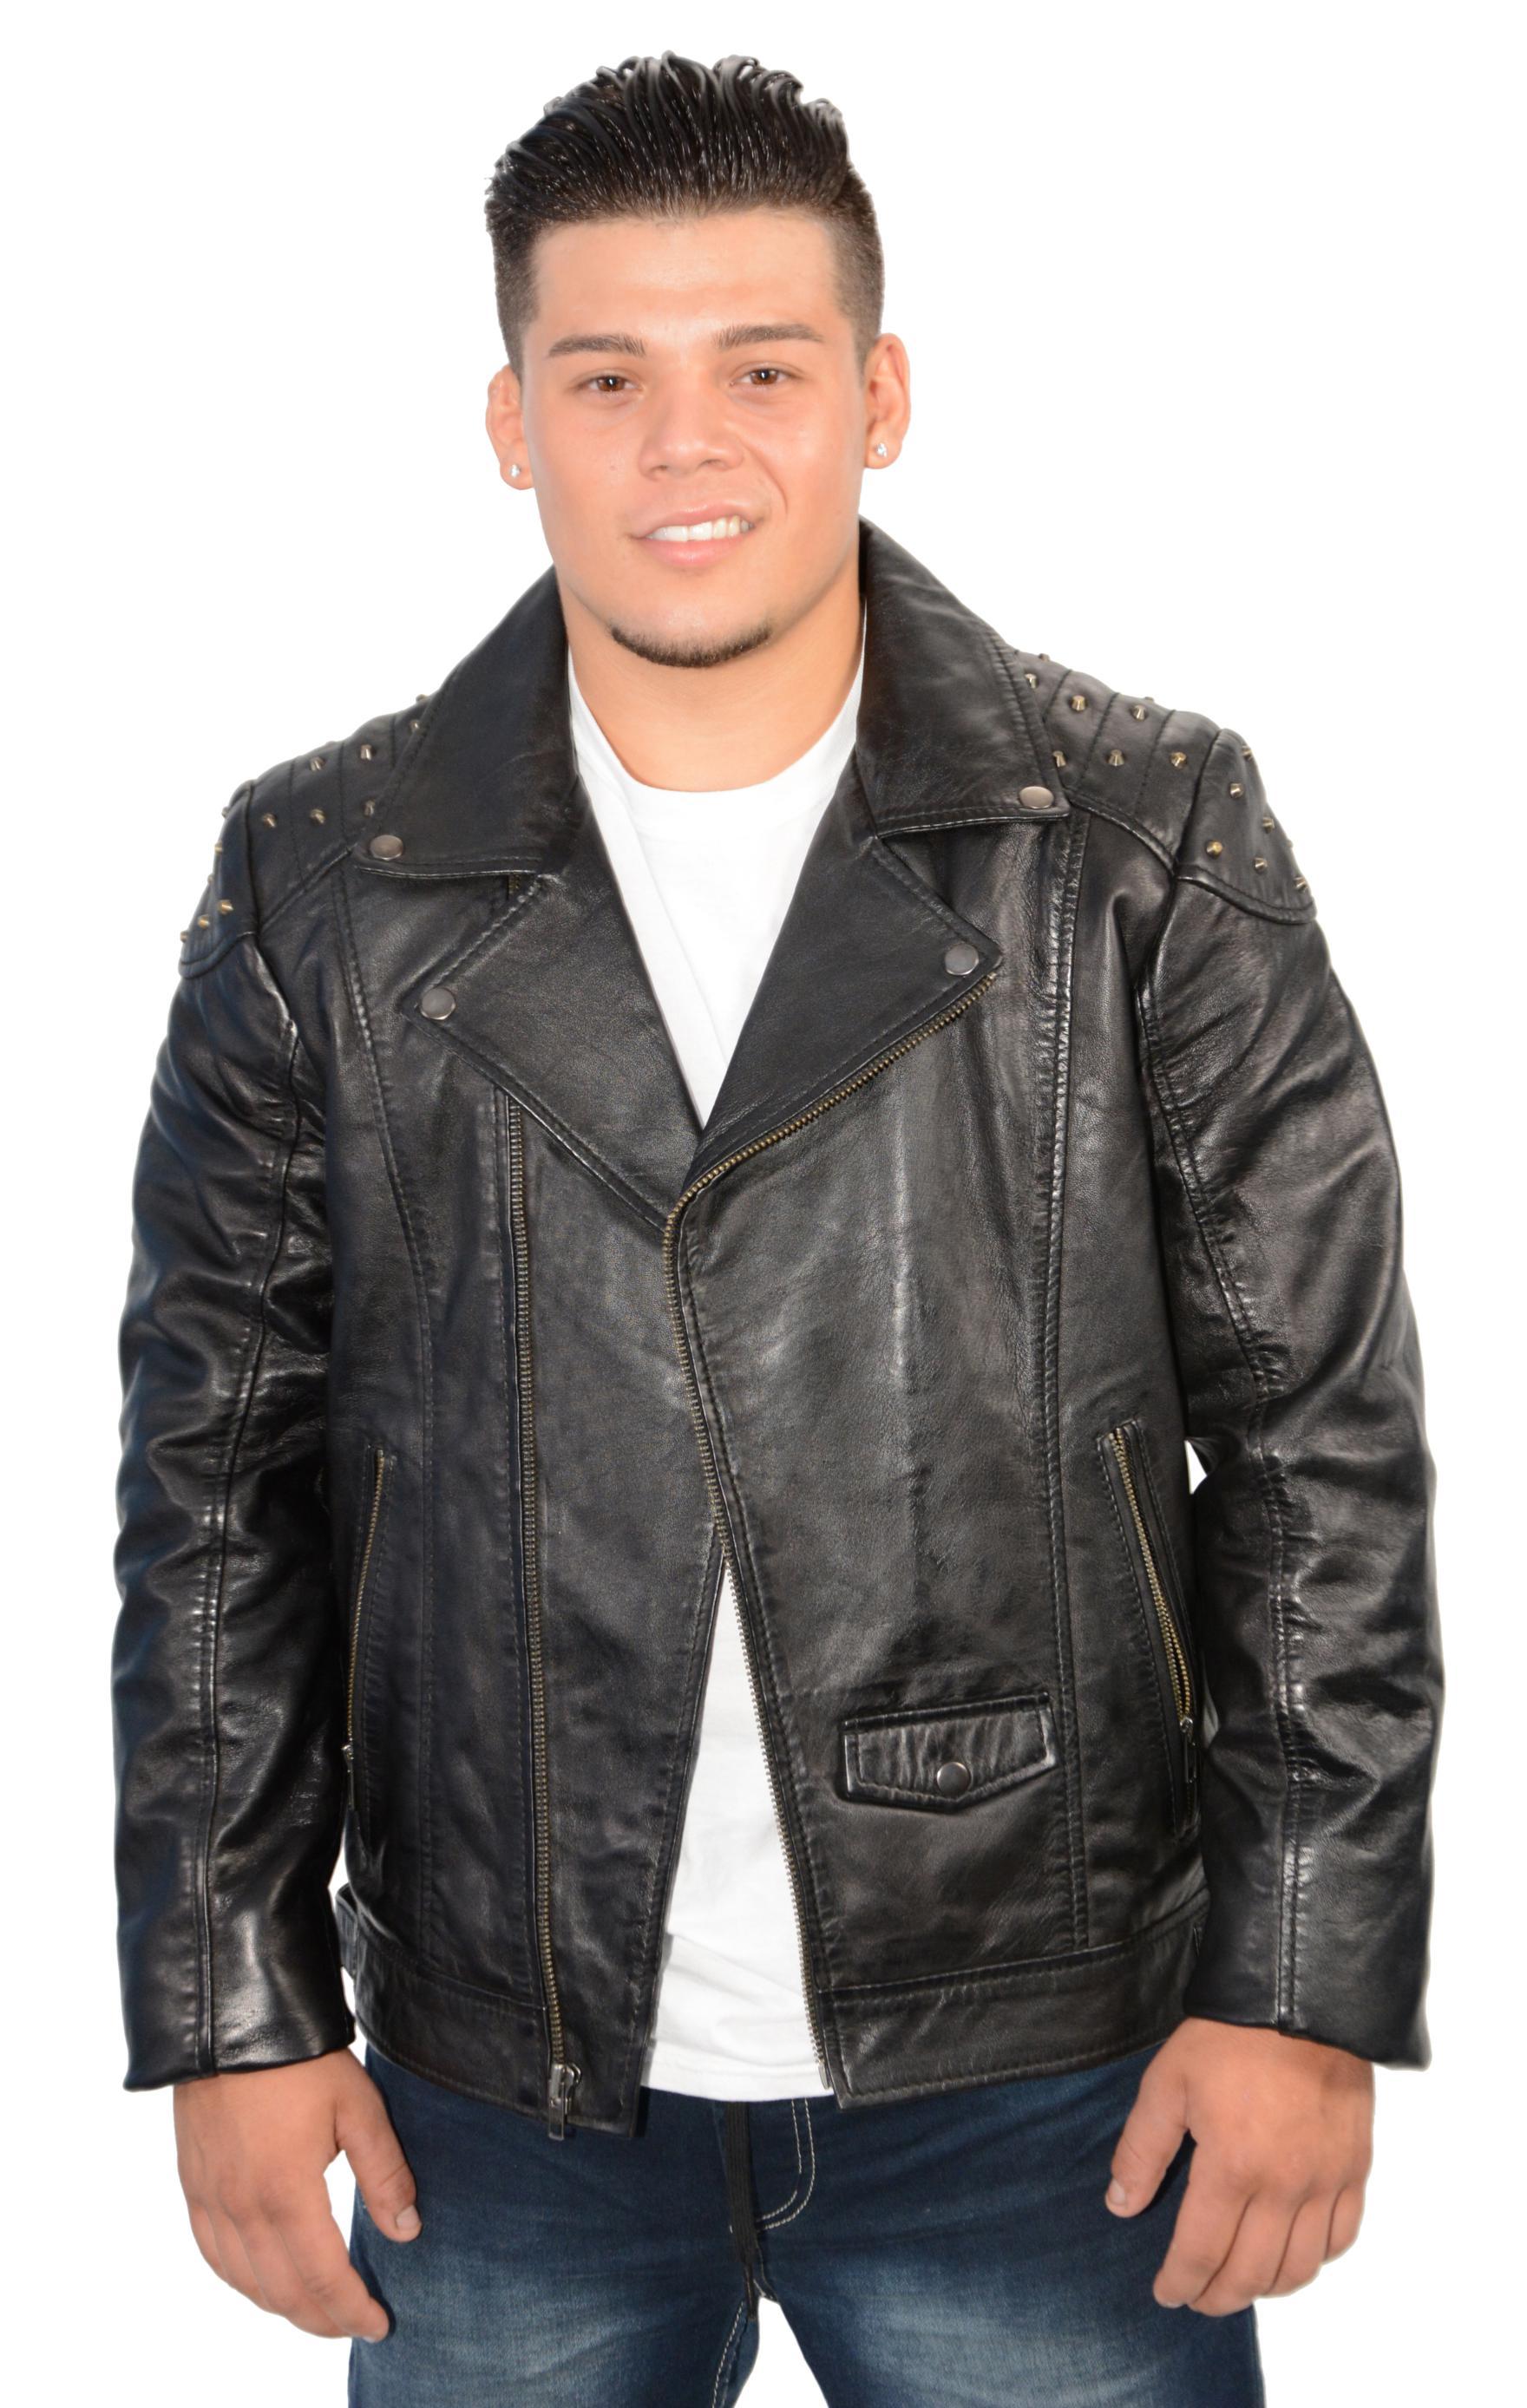 Mens Black Lambskin Leather Jacket Classic Motorcyle Look